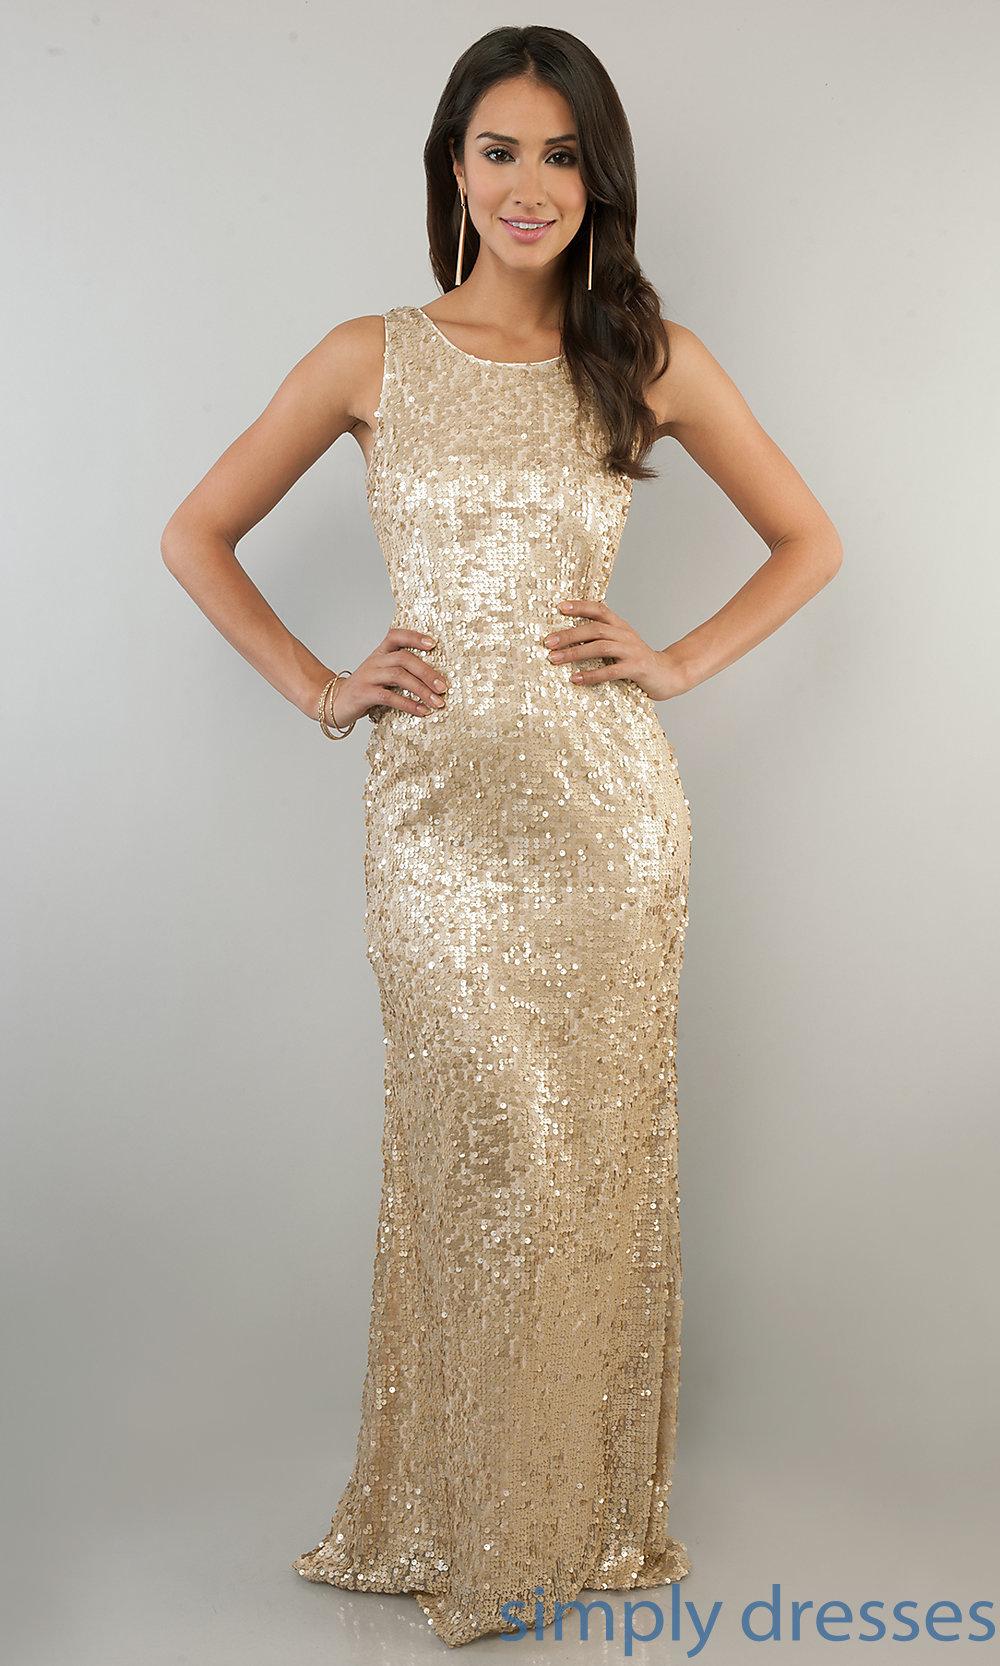 A woman wearing a Gold dress.